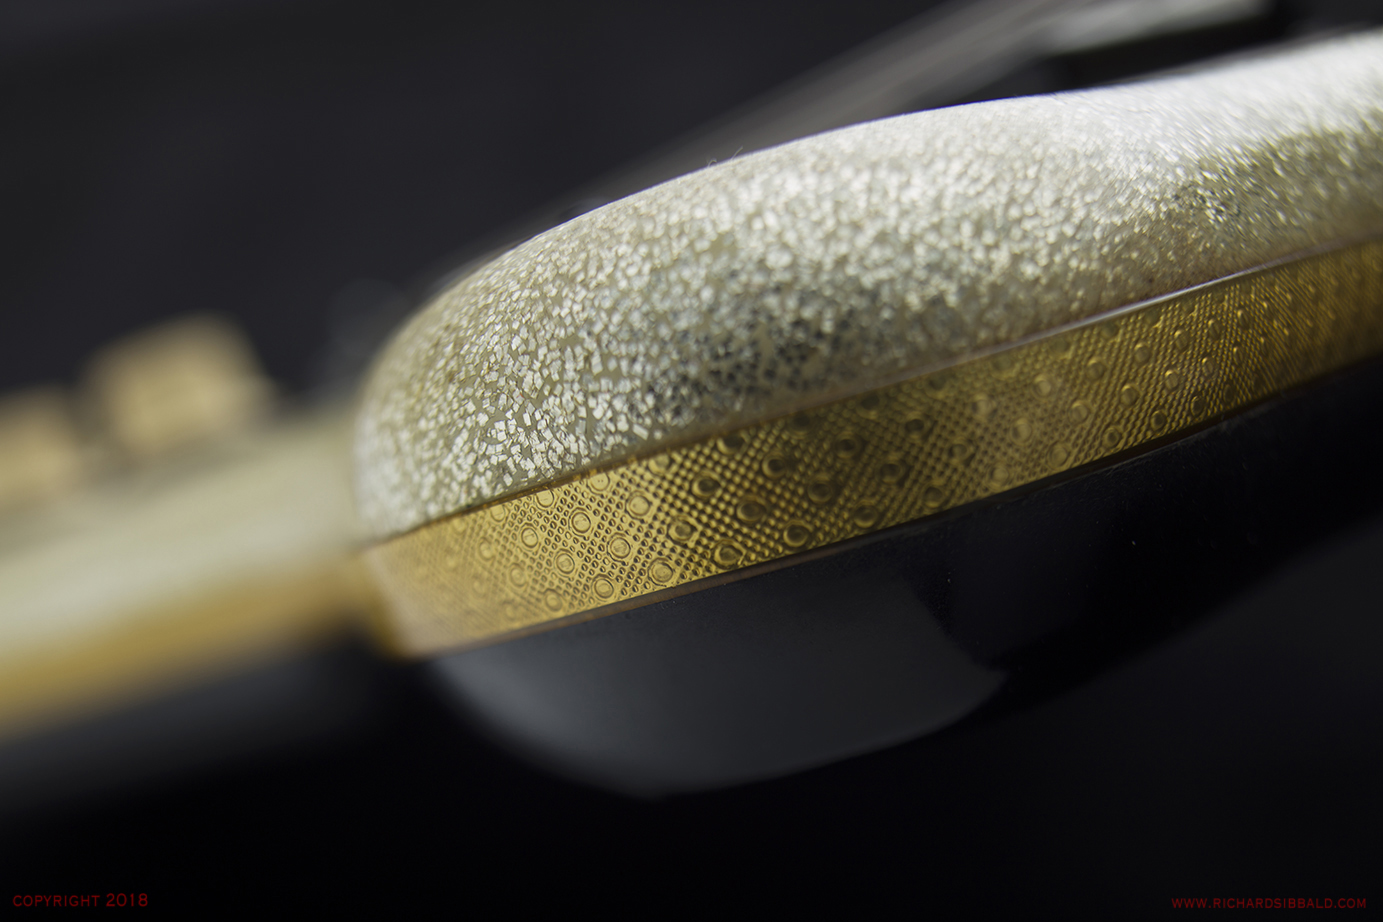 EKO-60-1100-MB-2-GOLD-SPARKLE-NSN-071.jpg